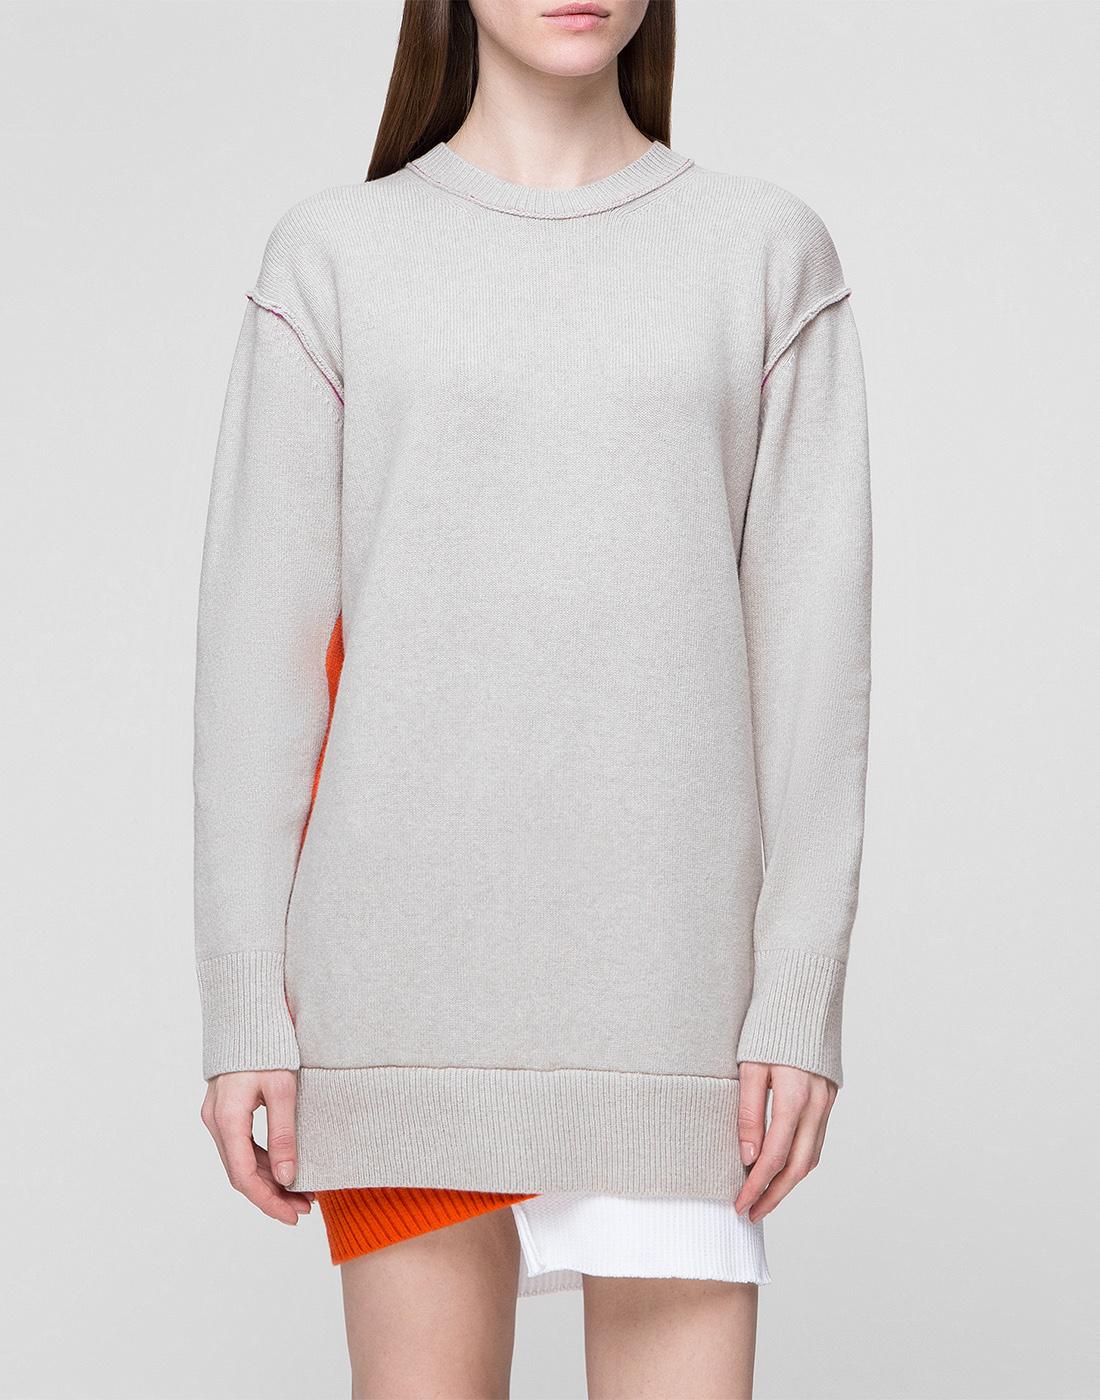 Женское бежевое шерстяное платье Dorothee Schumacher S516304/031-2